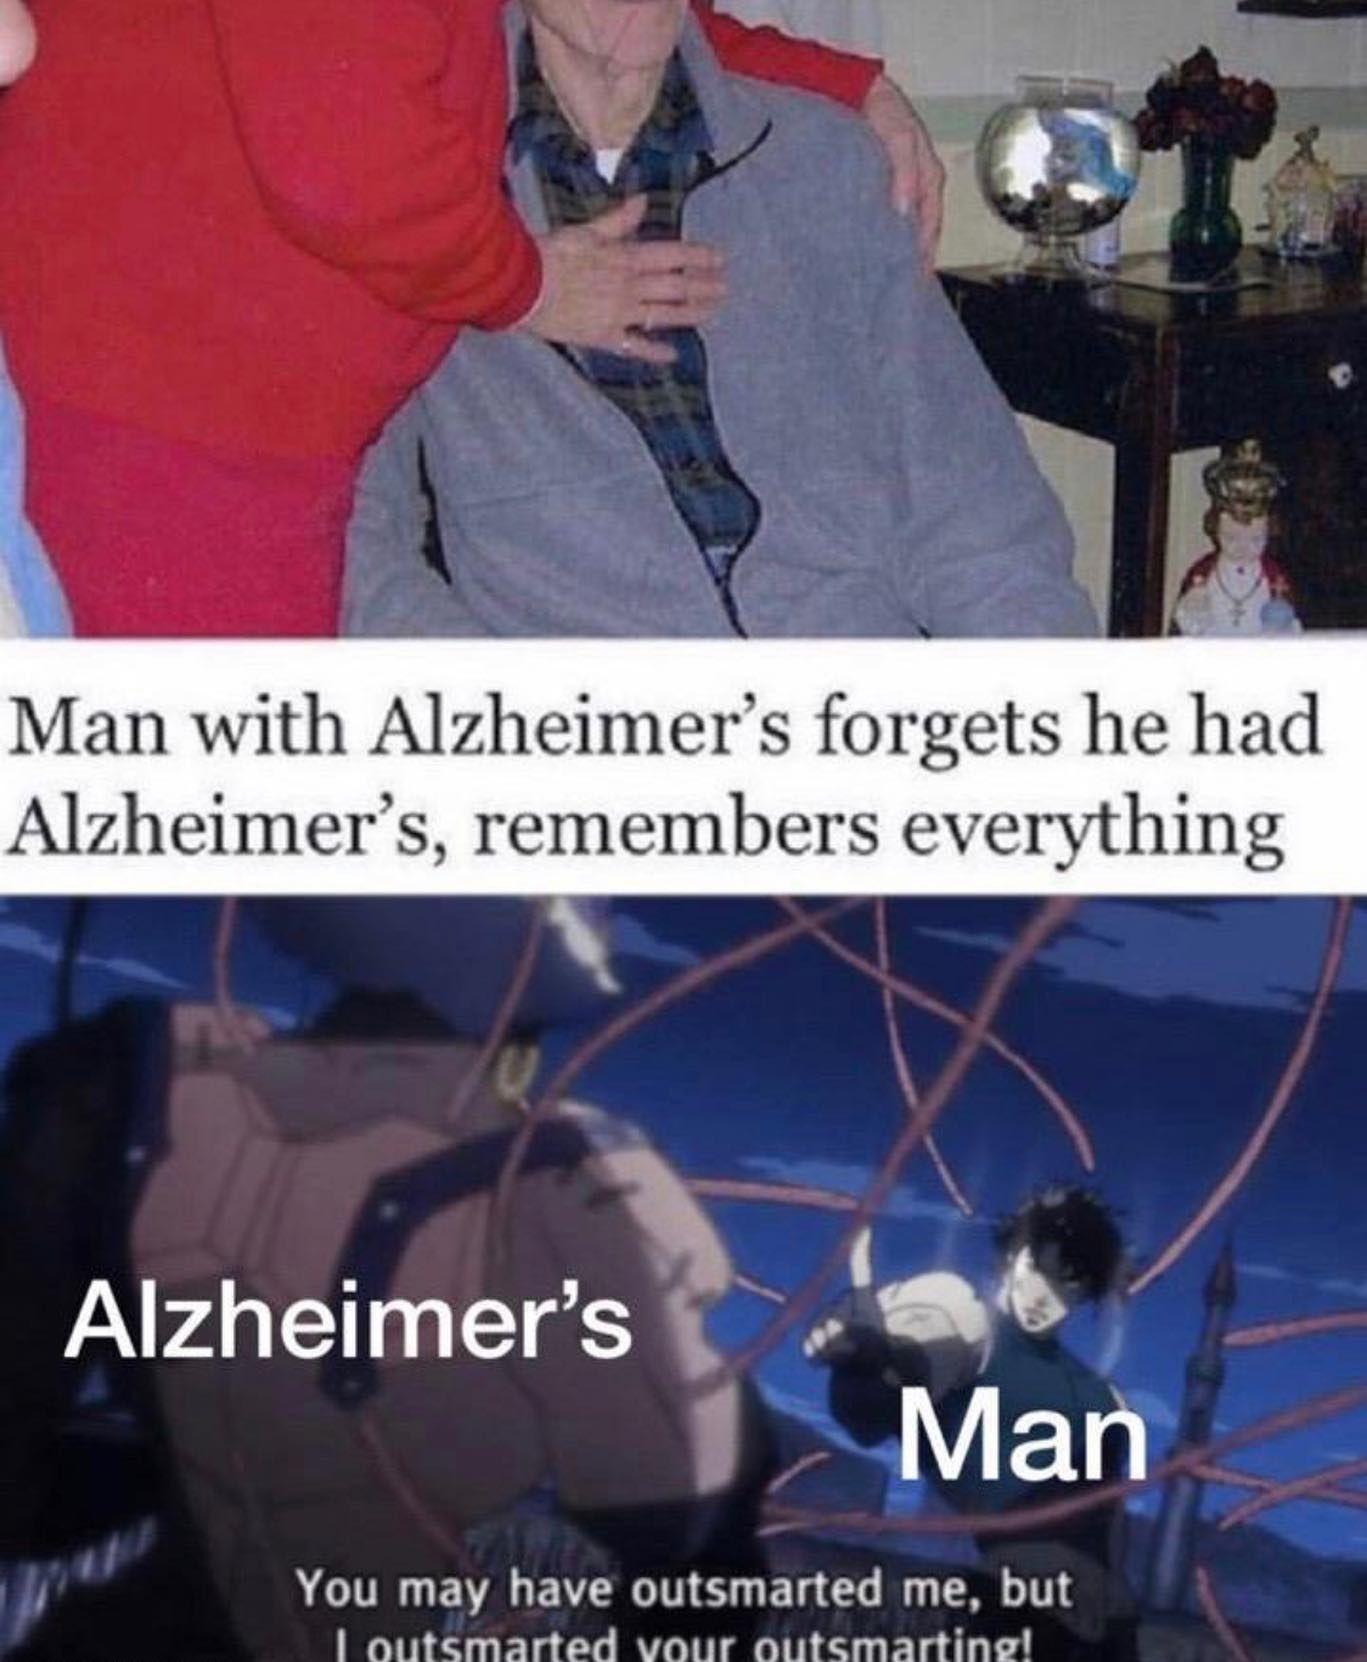 That S A Pro Gamer Move Credit Reddit U Cringybhoi Meme Memes Outsmartoutplay Smartmemes Really Funny Memes Stupid Memes Funny School Memes